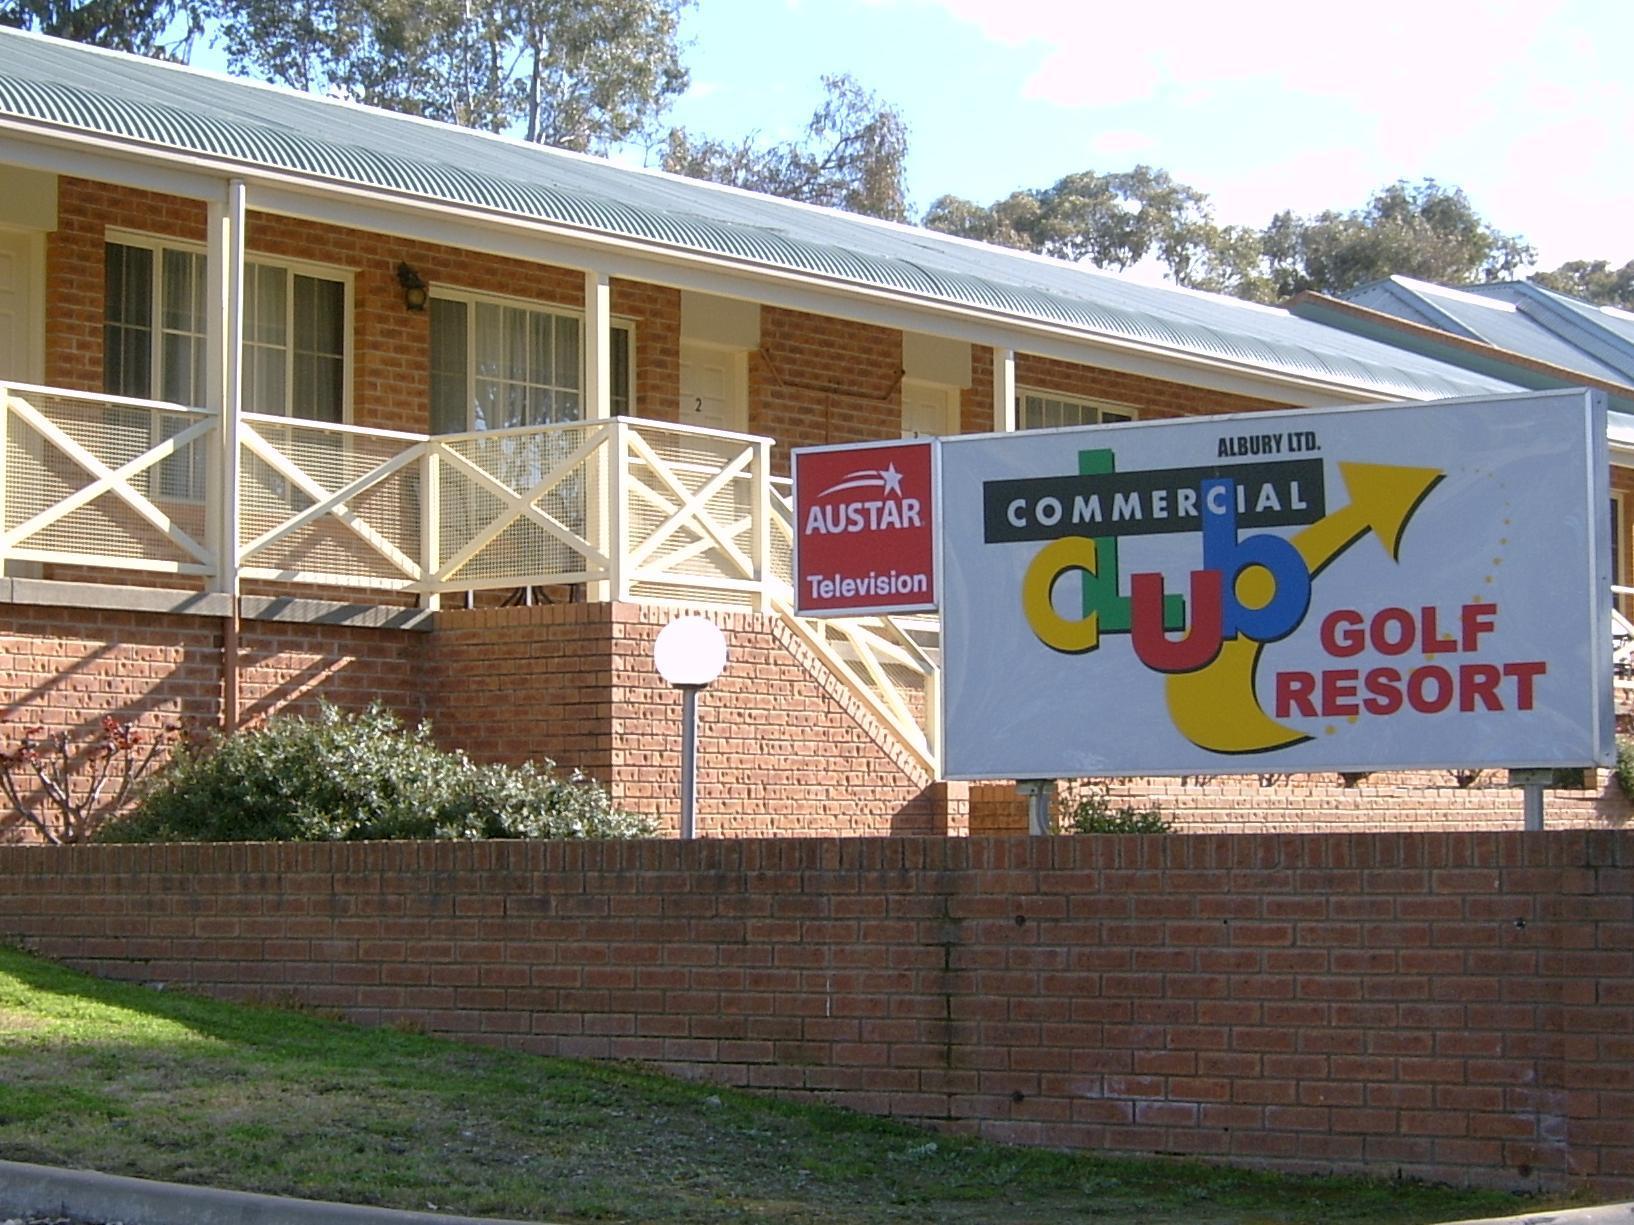 Commercial Golf Resort - Hotell och Boende i Australien , Albury